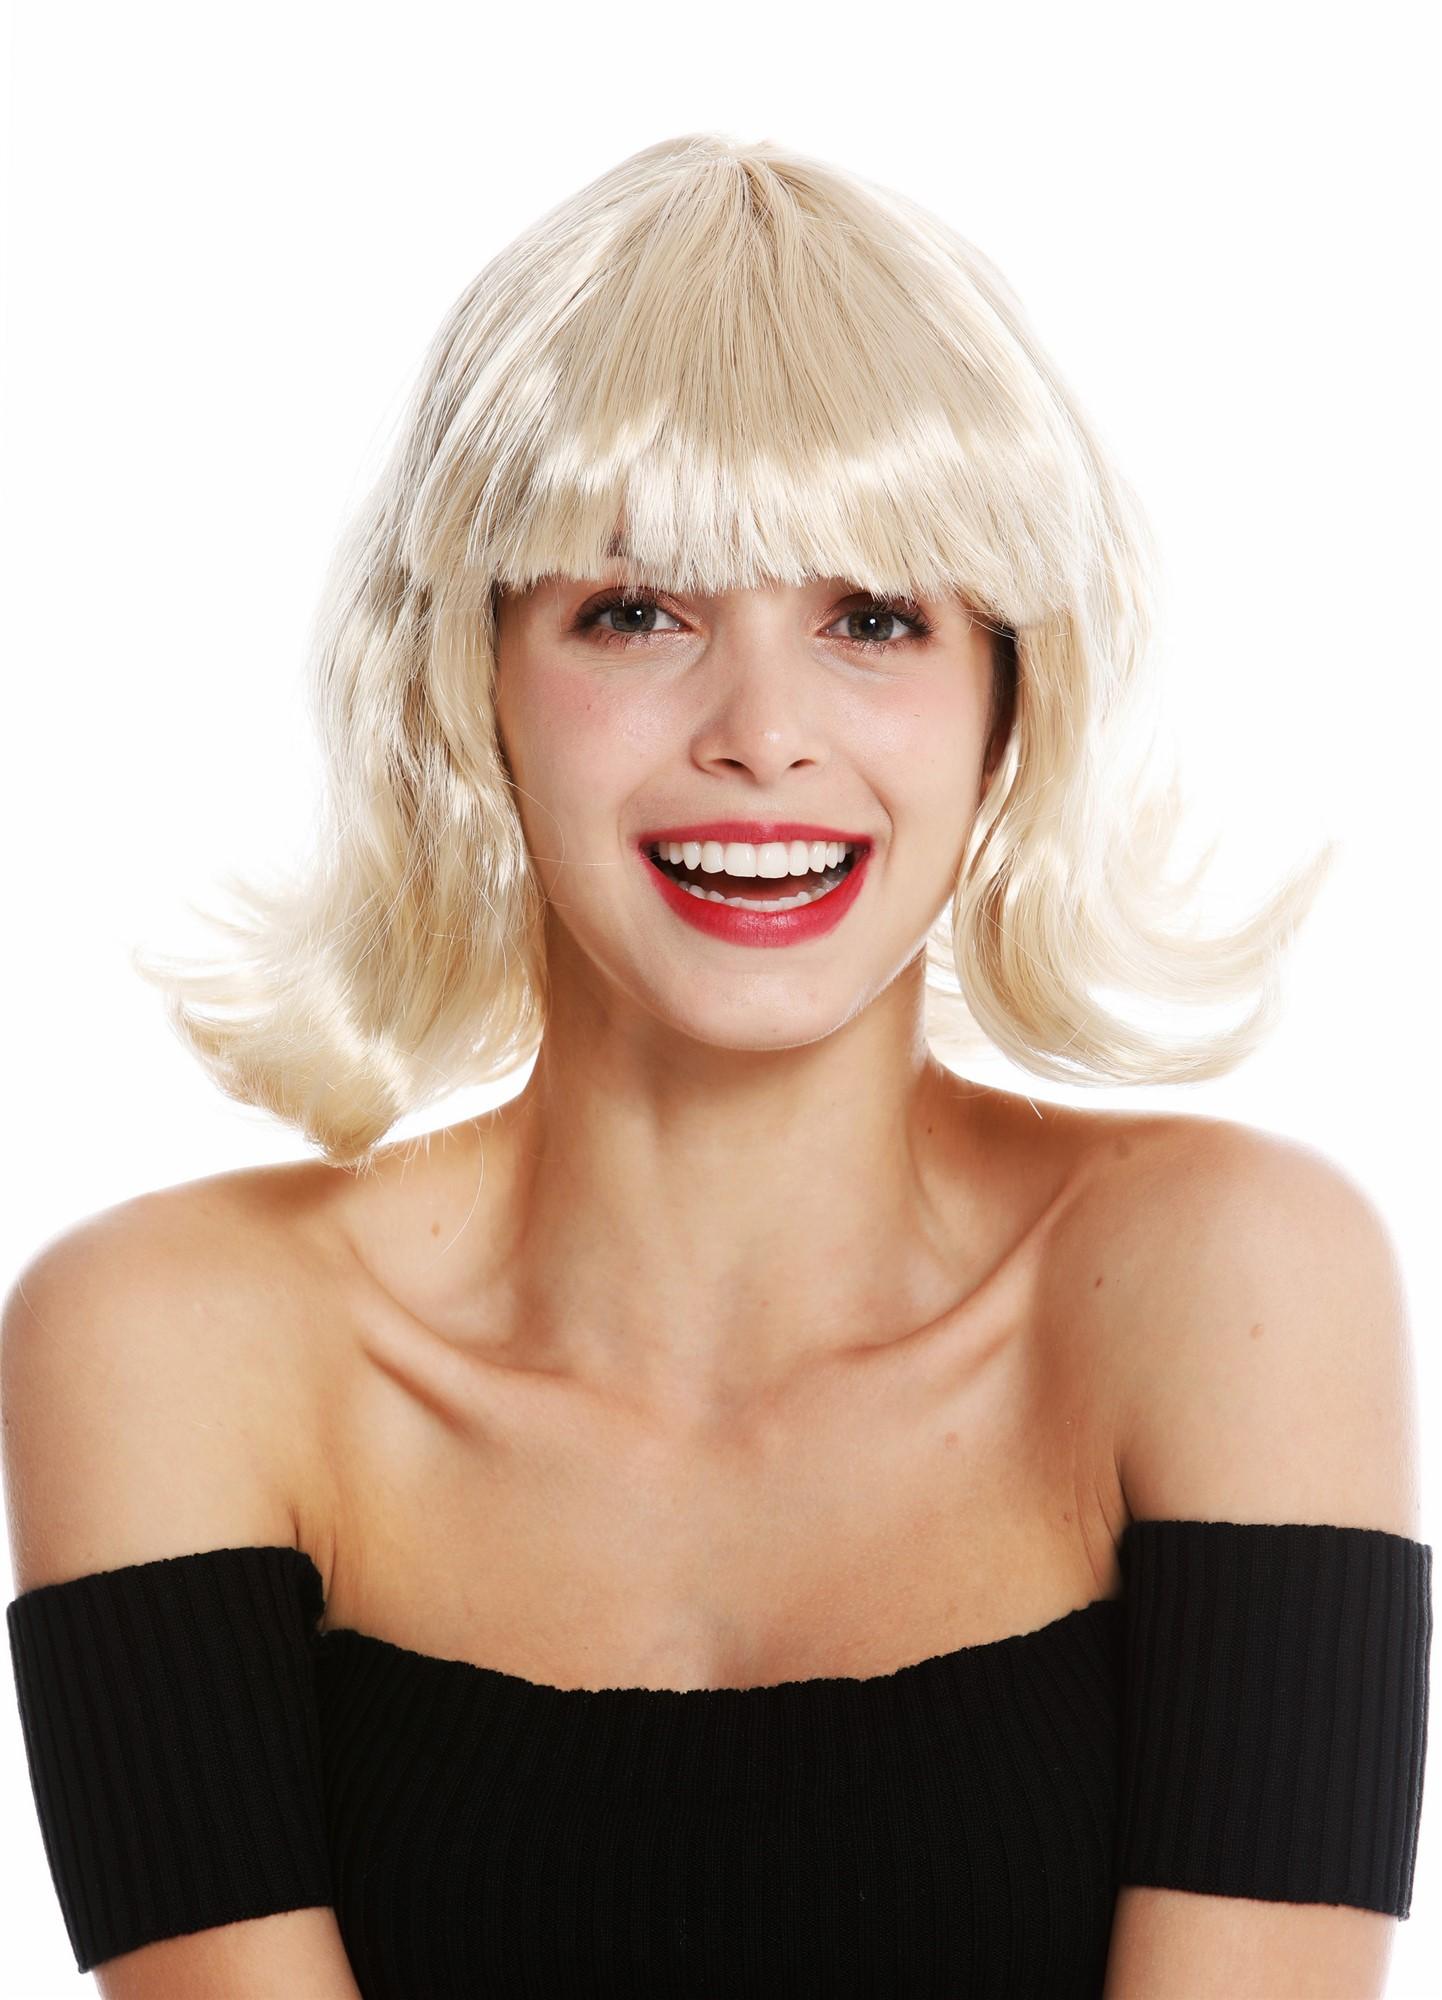 perücke longbob kurz blond wellig modell: 90793dress me up